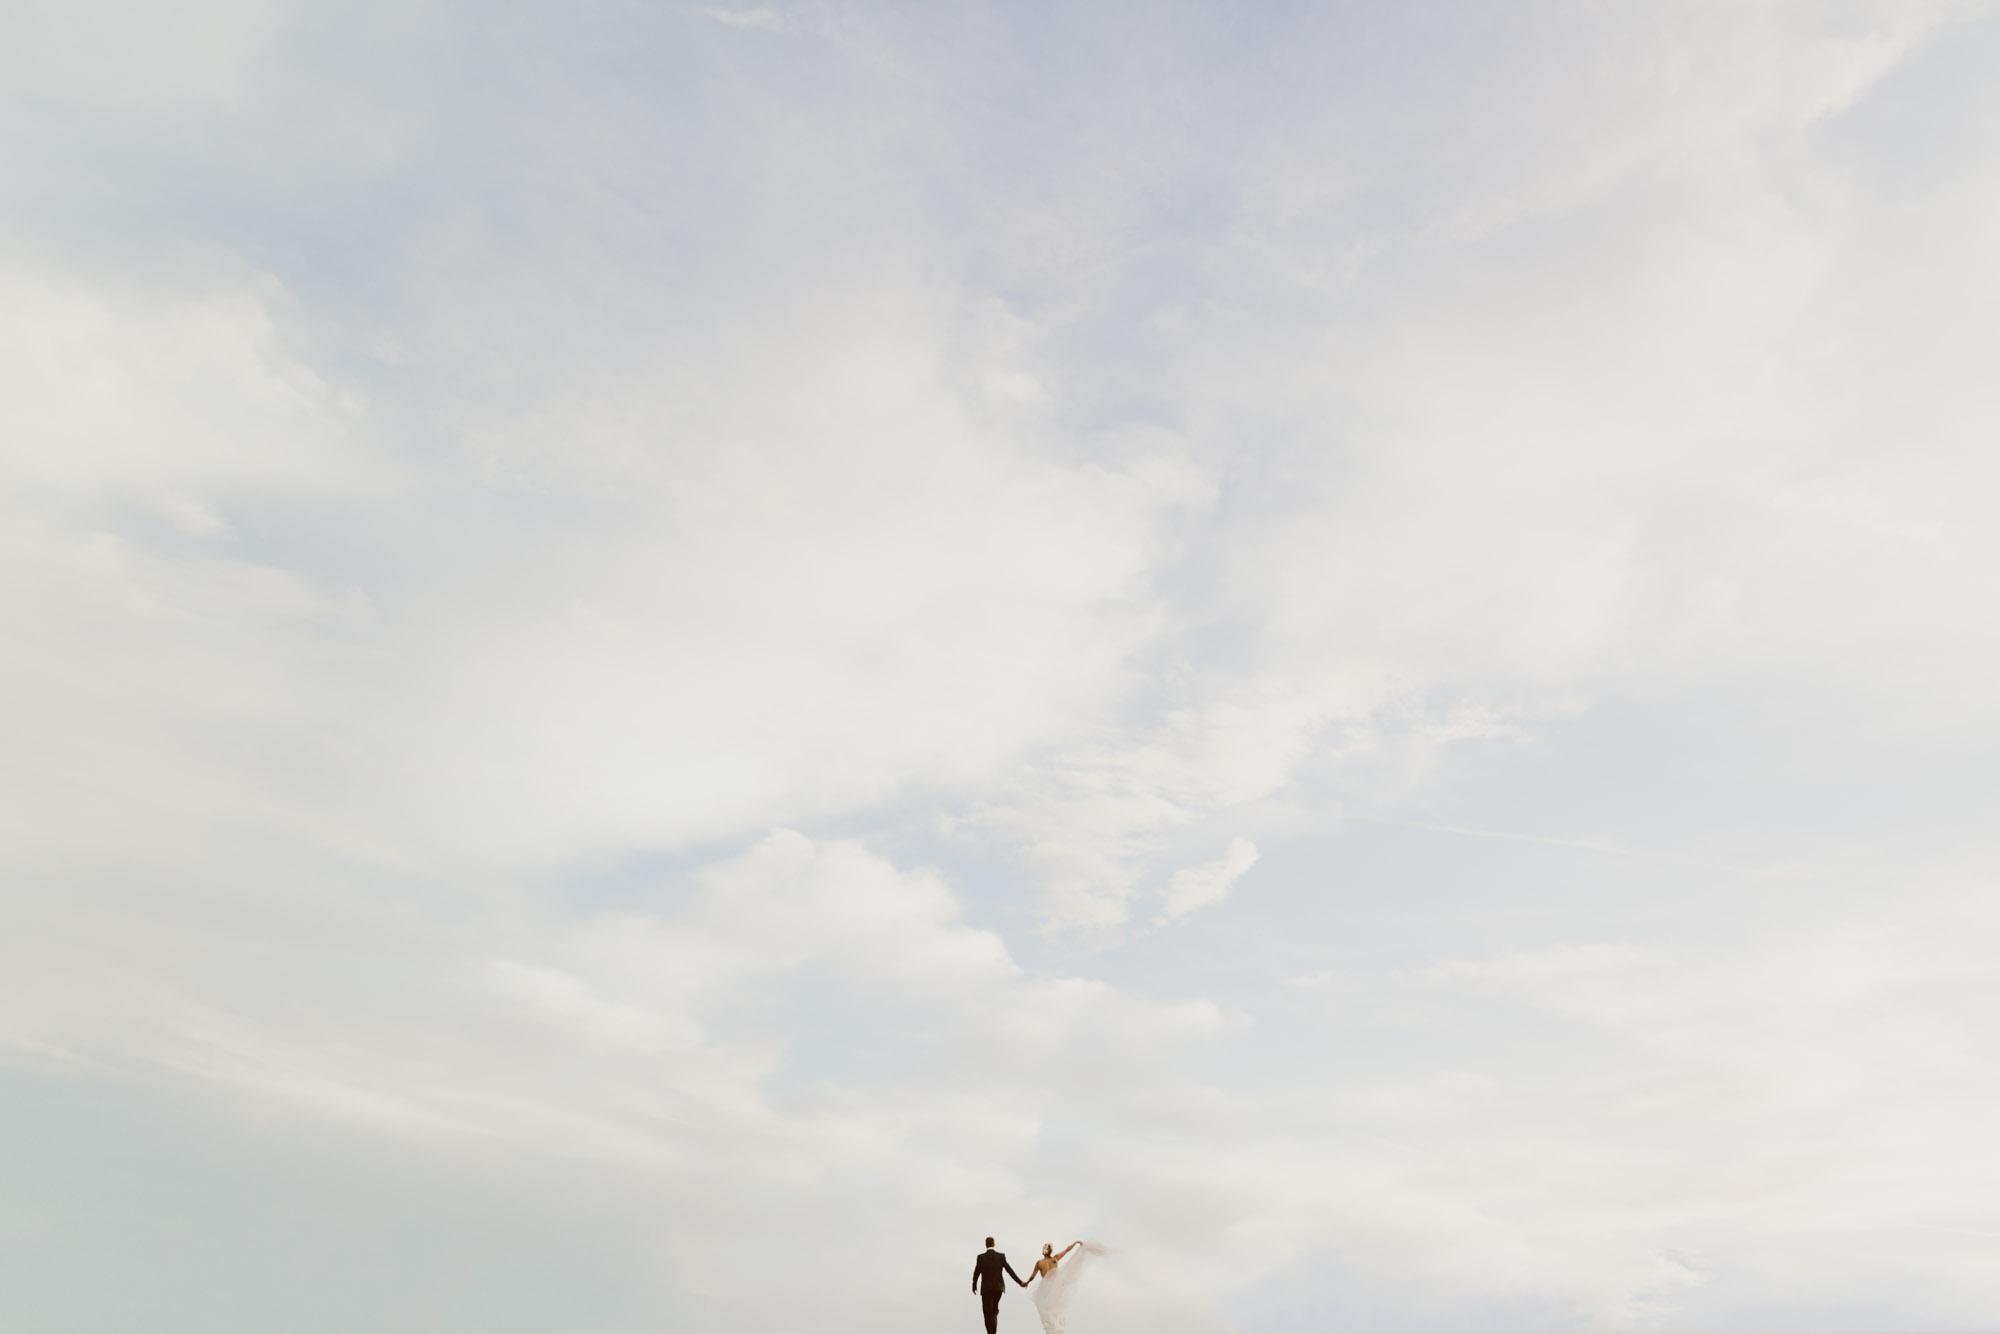 omaha-wedding-photographer-meghan-time-52.jpg